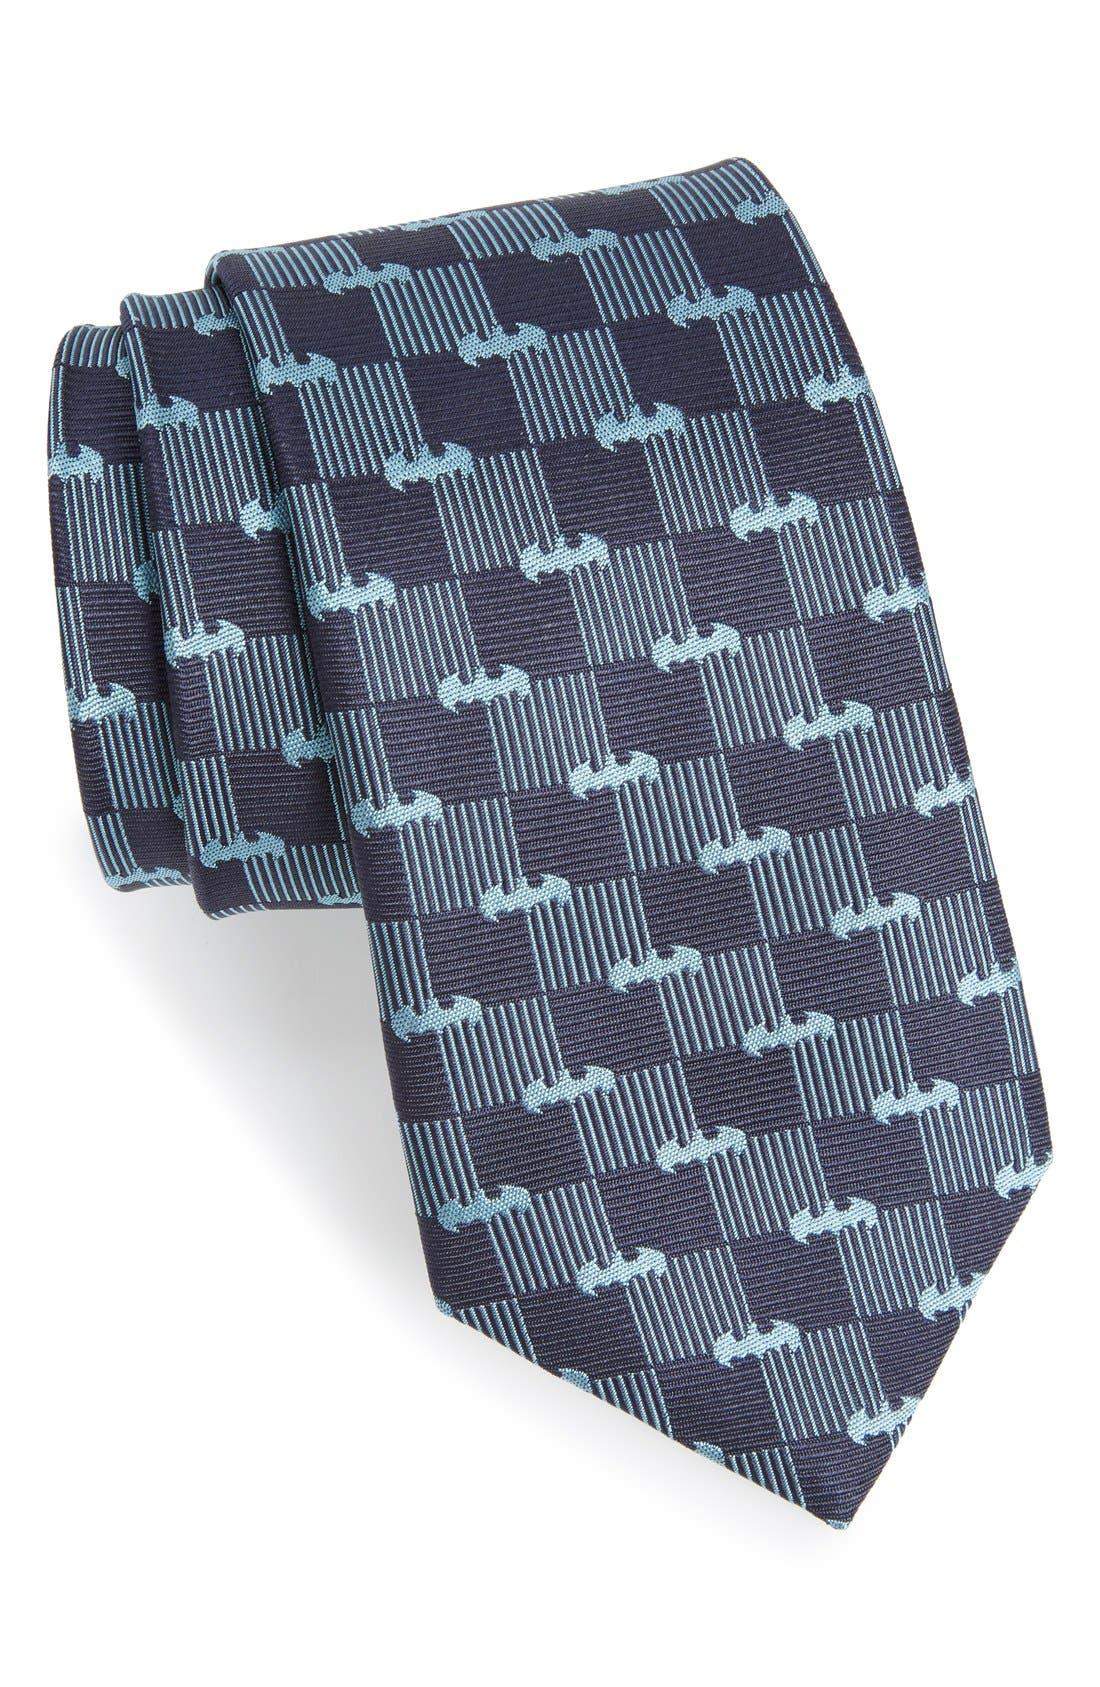 Cufflinks, Inc. 'Batman' Silk Tie